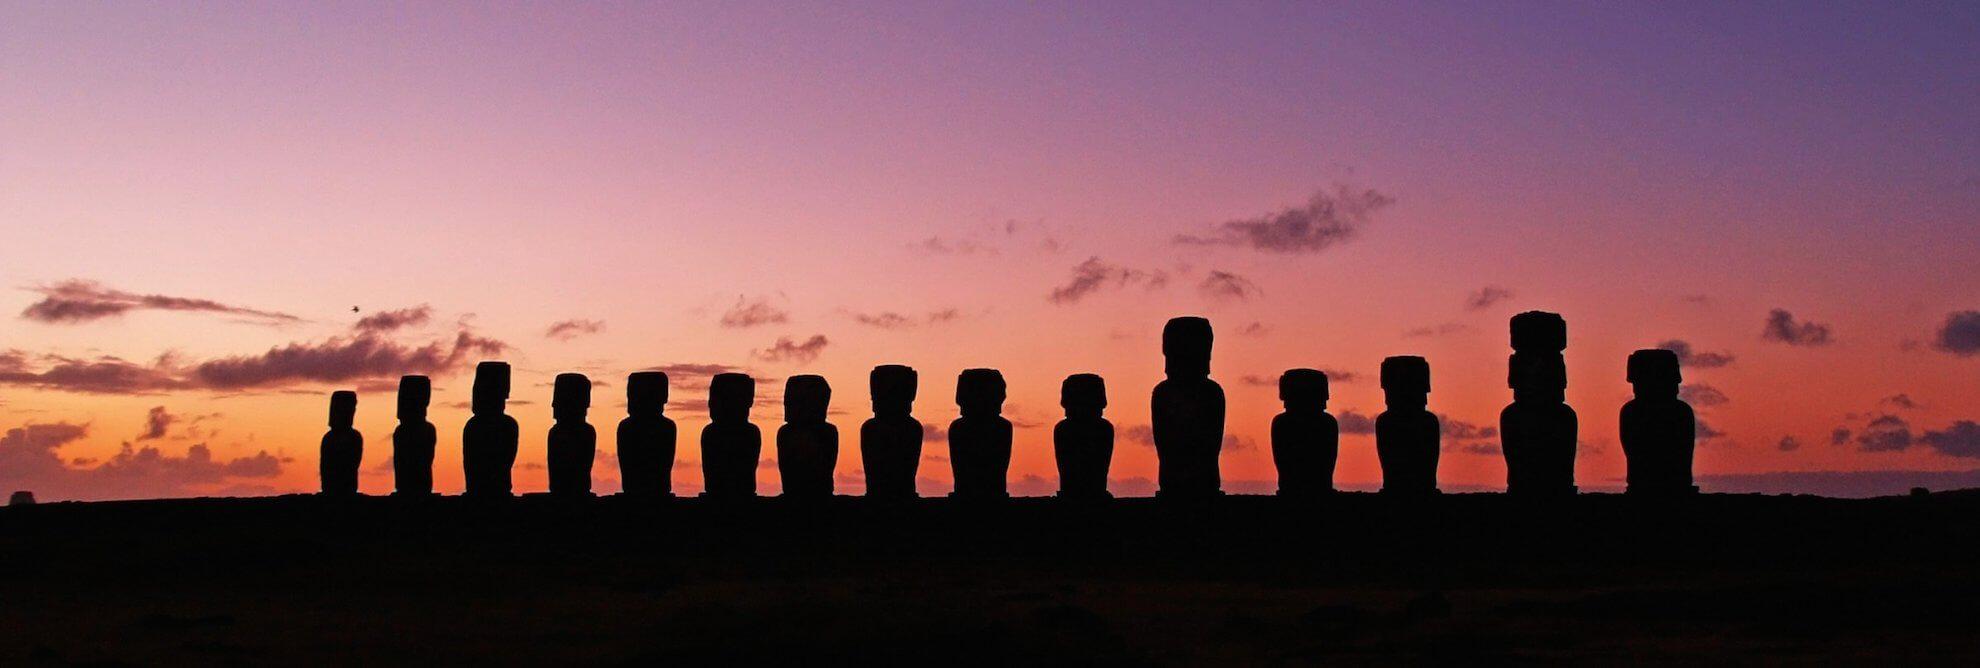 Osterinsel Rapa Nui - Tongariki bei Sonnenaufgang